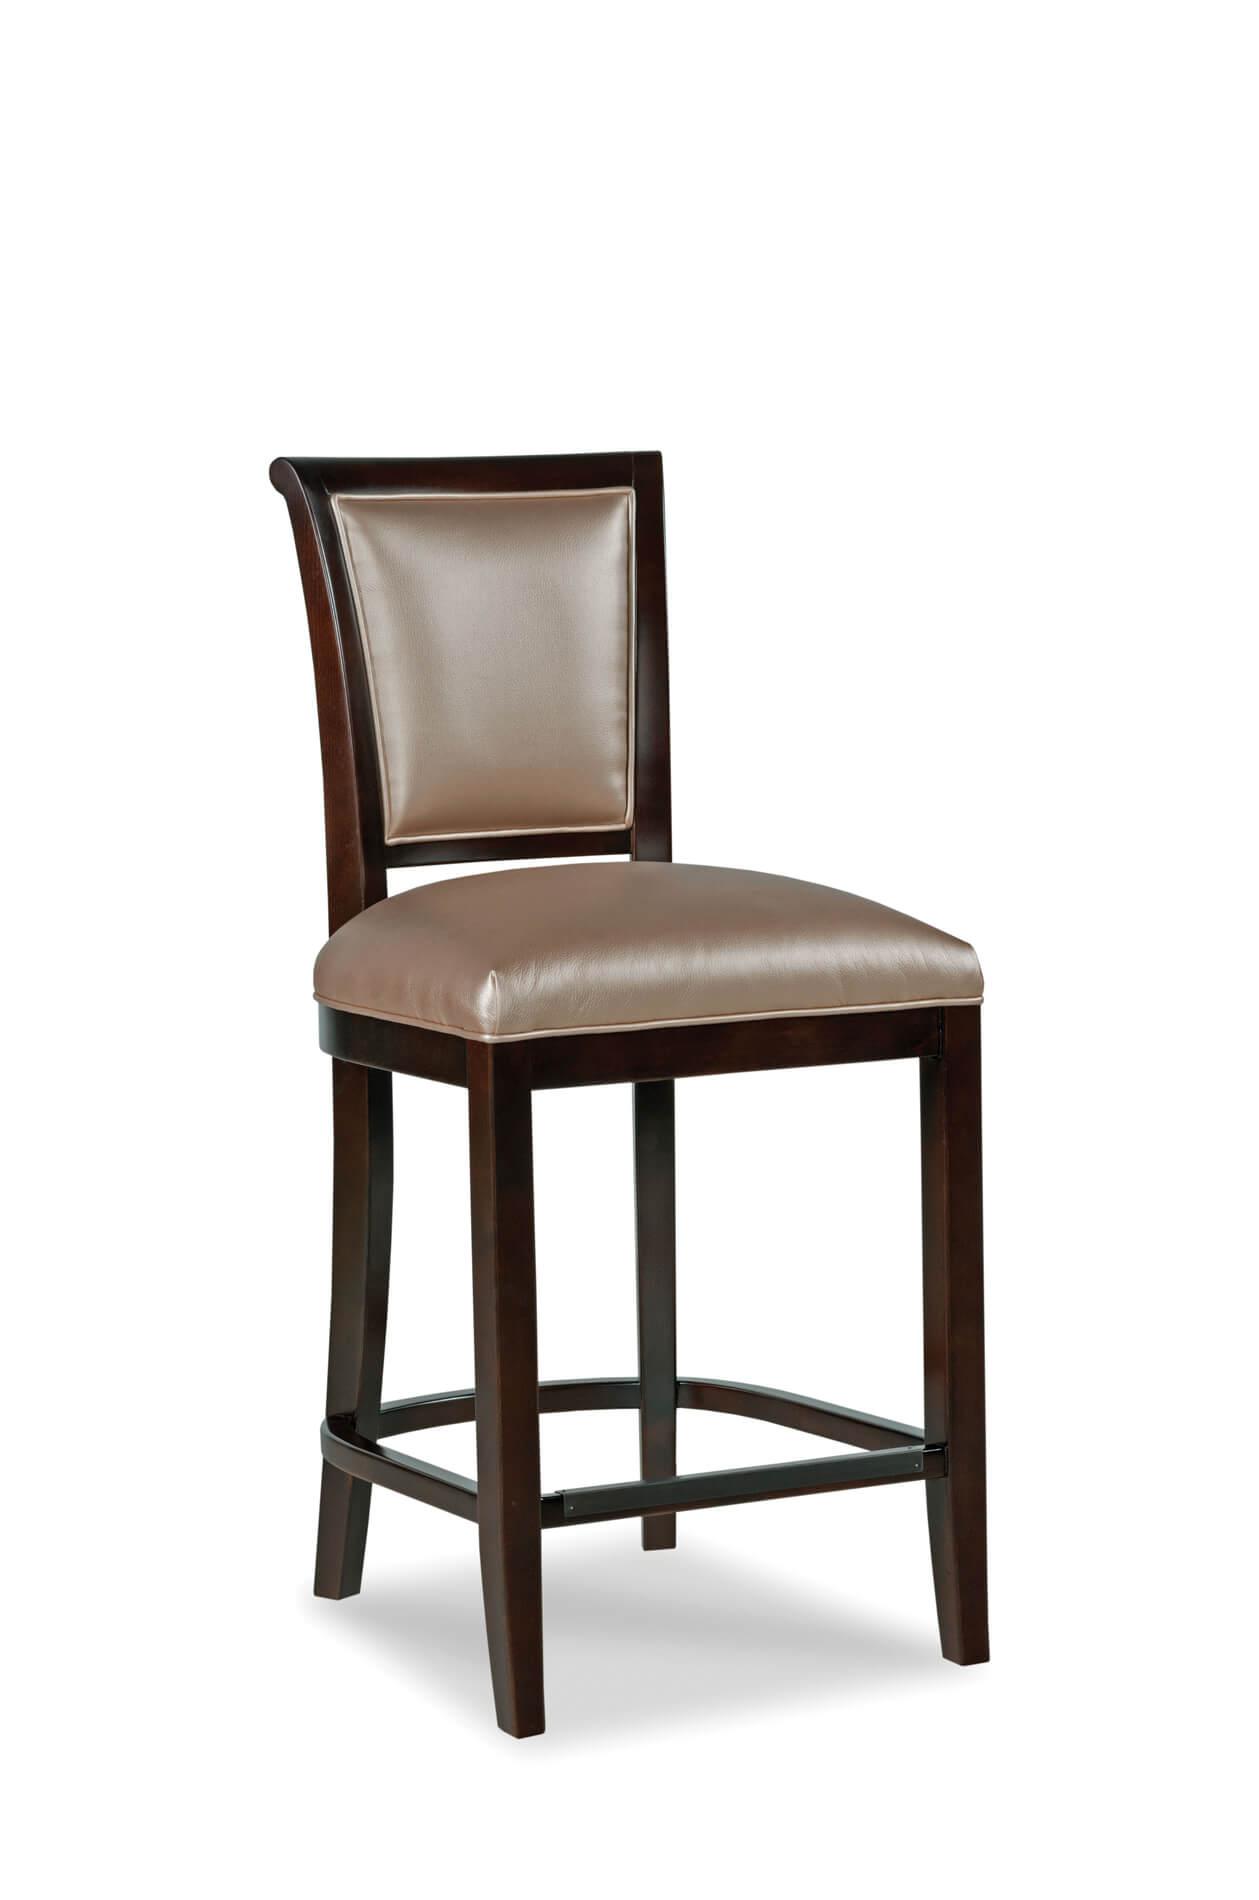 buy fairfield 39 s mackay upholstered wood barstool w back ships free. Black Bedroom Furniture Sets. Home Design Ideas